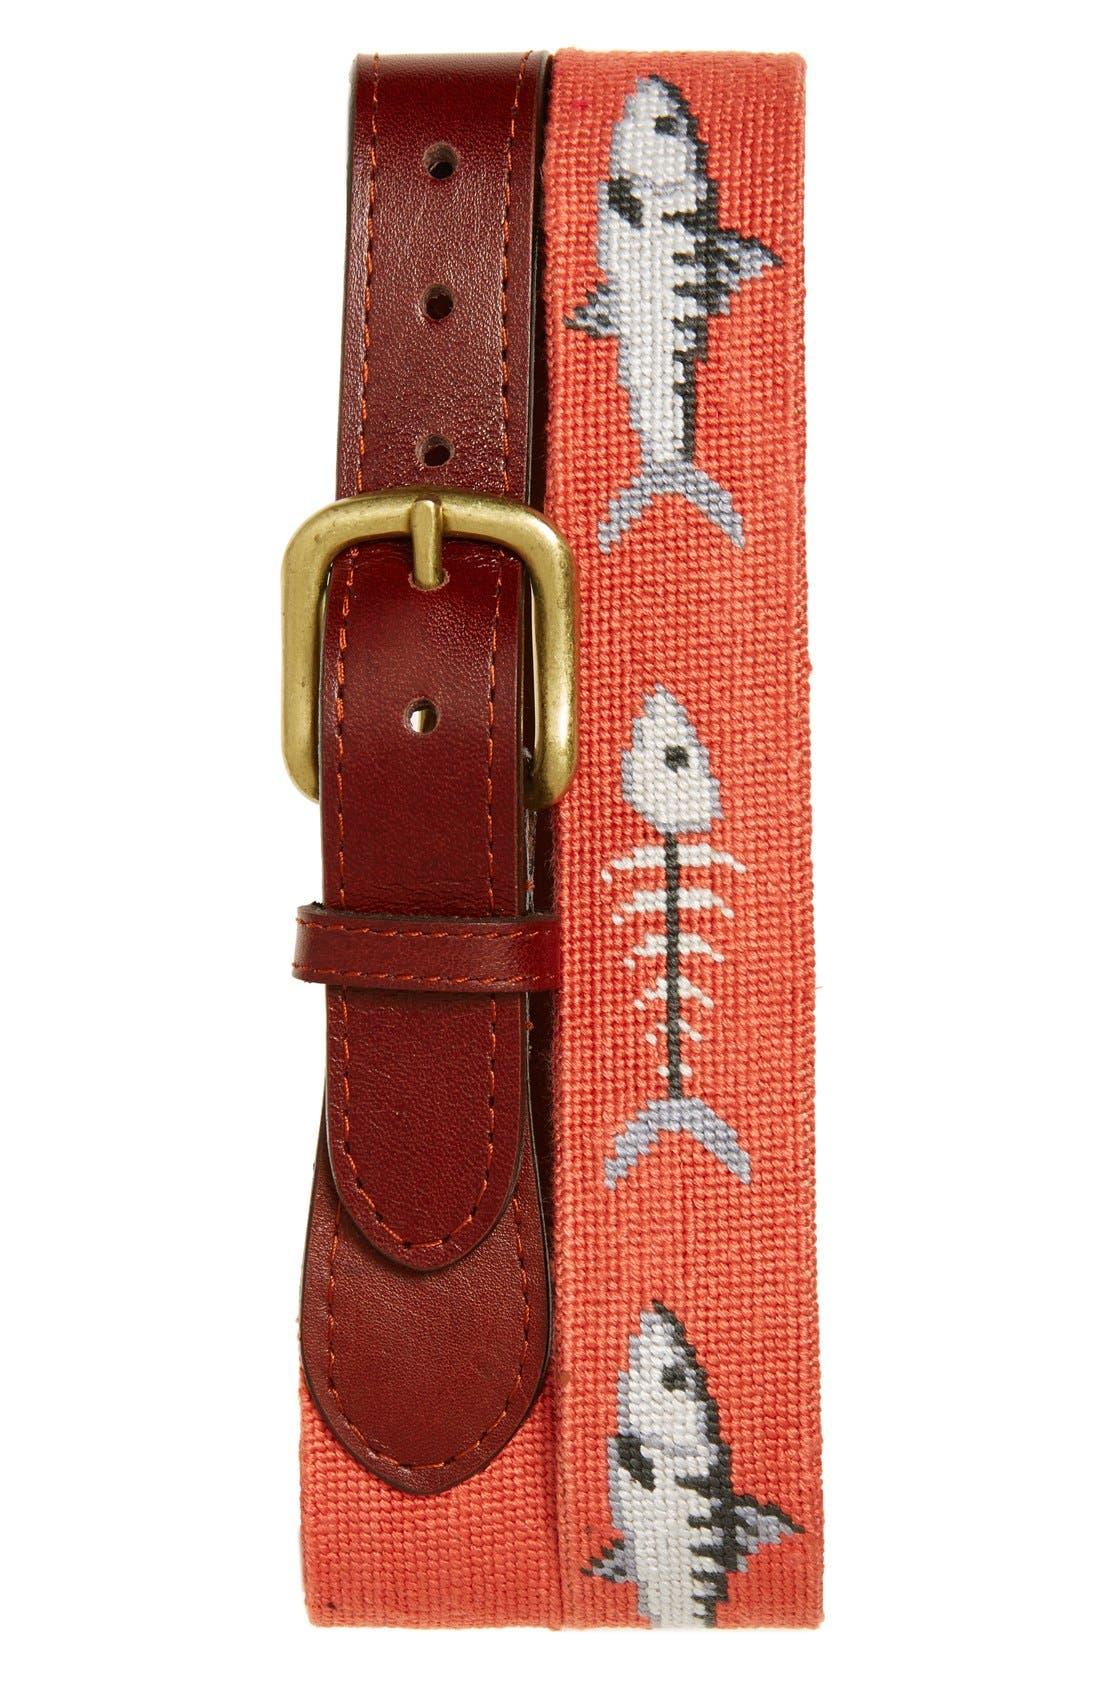 SMATHERS & BRANSON 'Bonefish' Needlepoint Belt, Main, color, 830